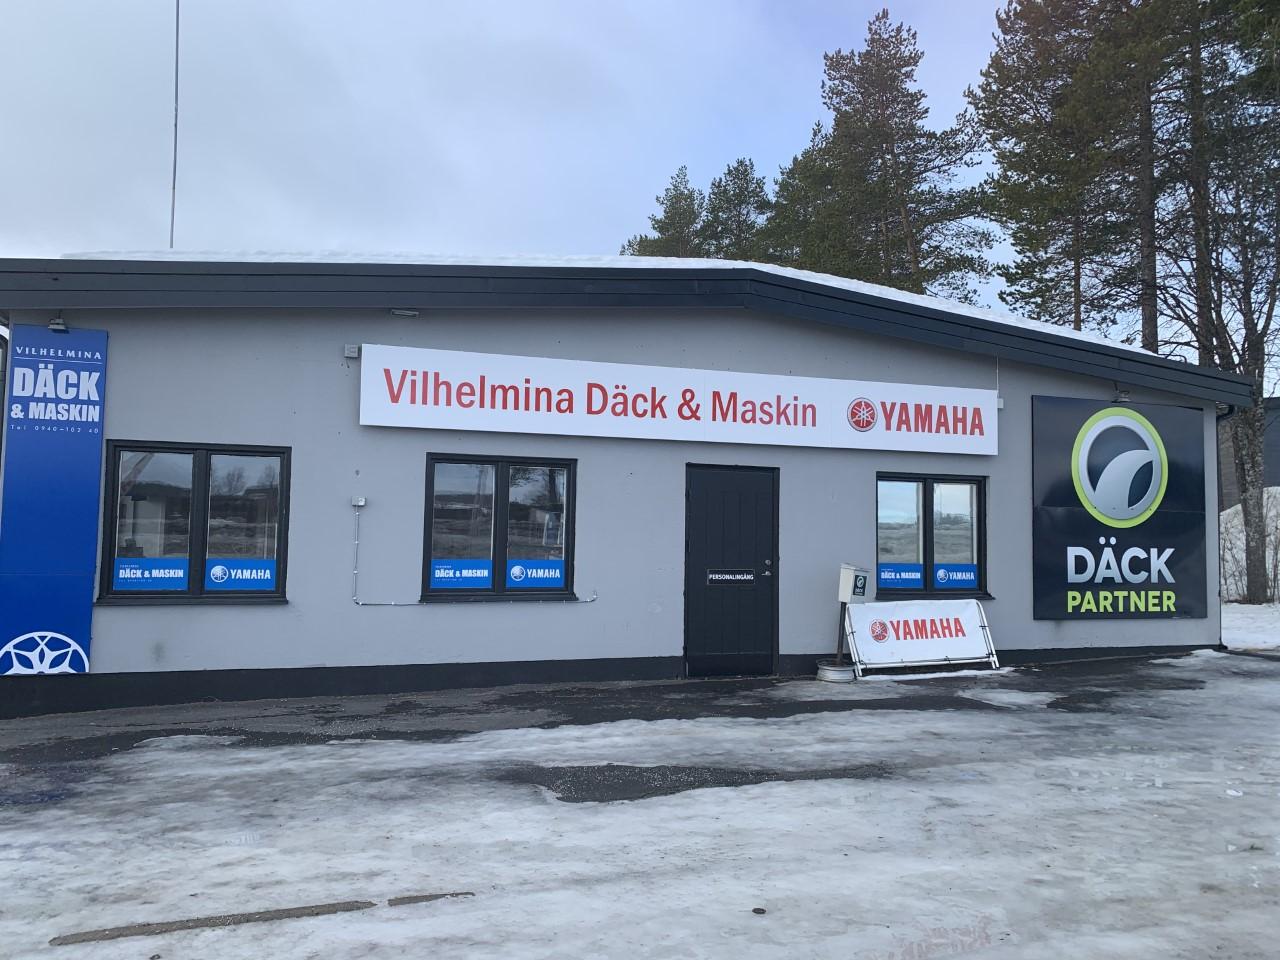 Vilhelmina Däck & Maskin